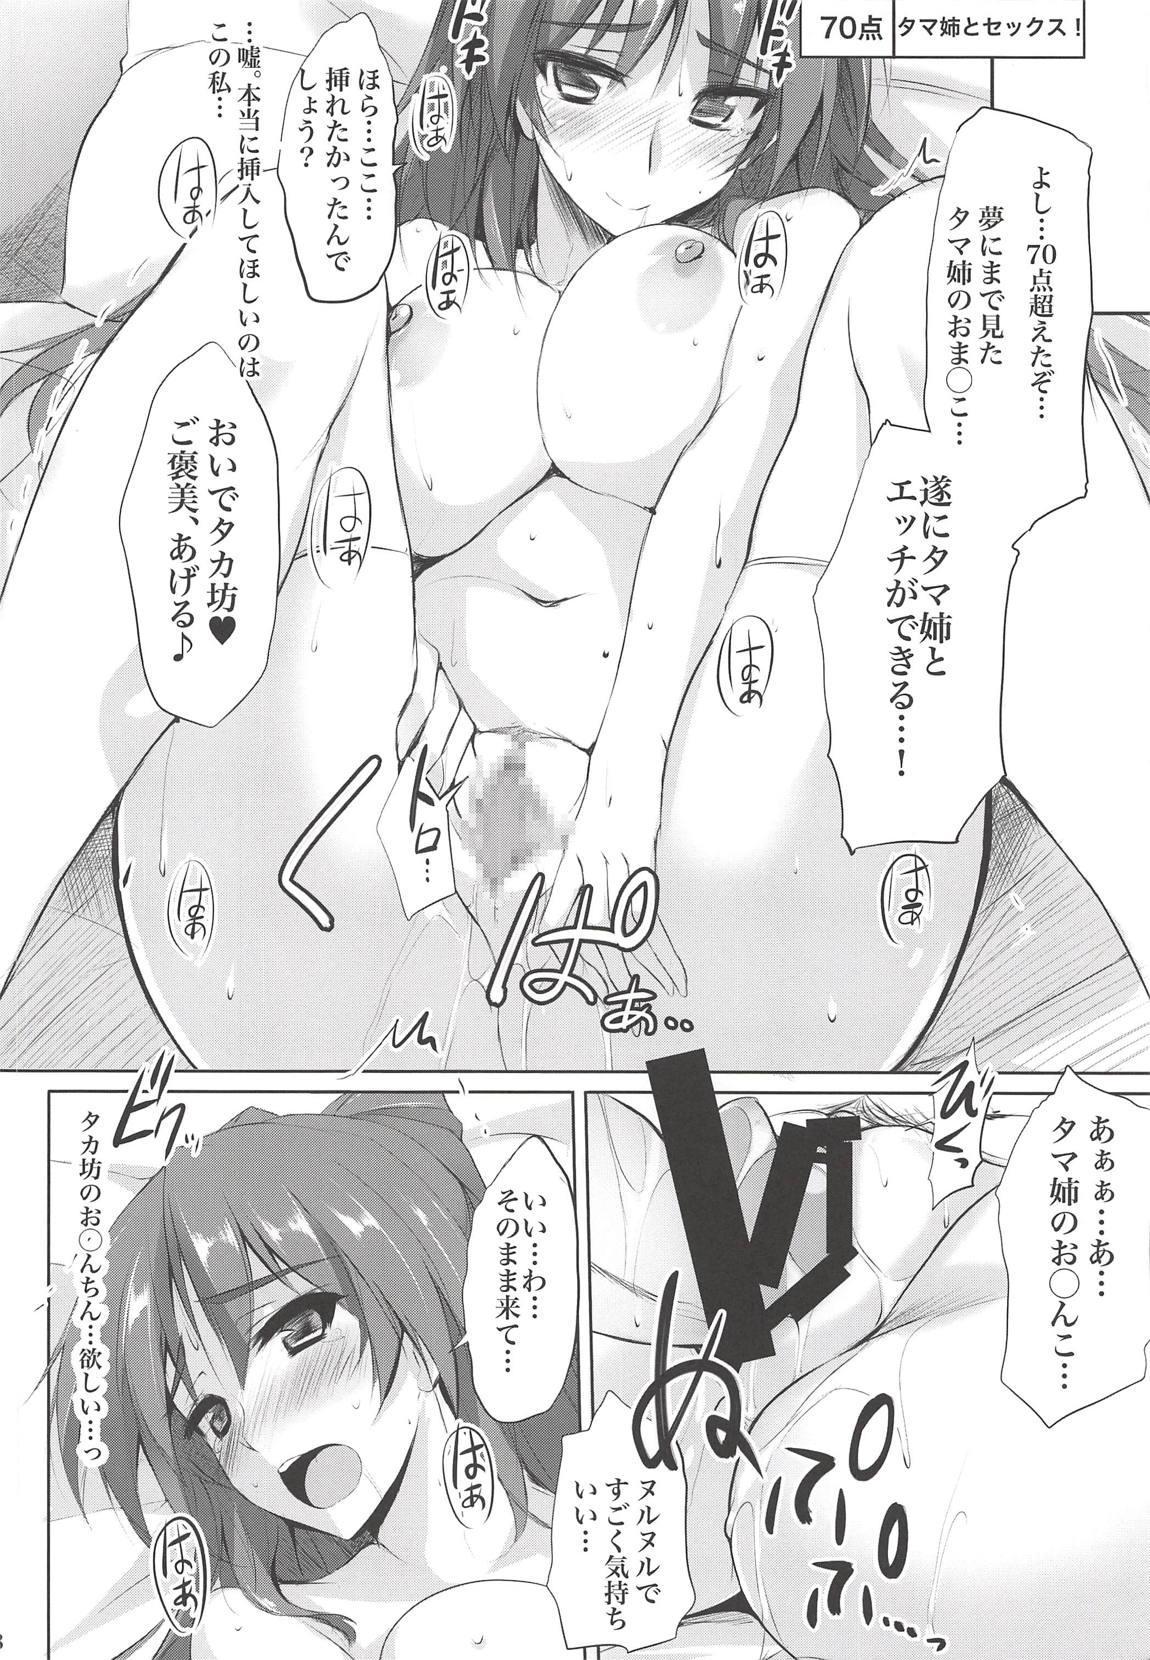 Akaten Sensei Inran Semi 6